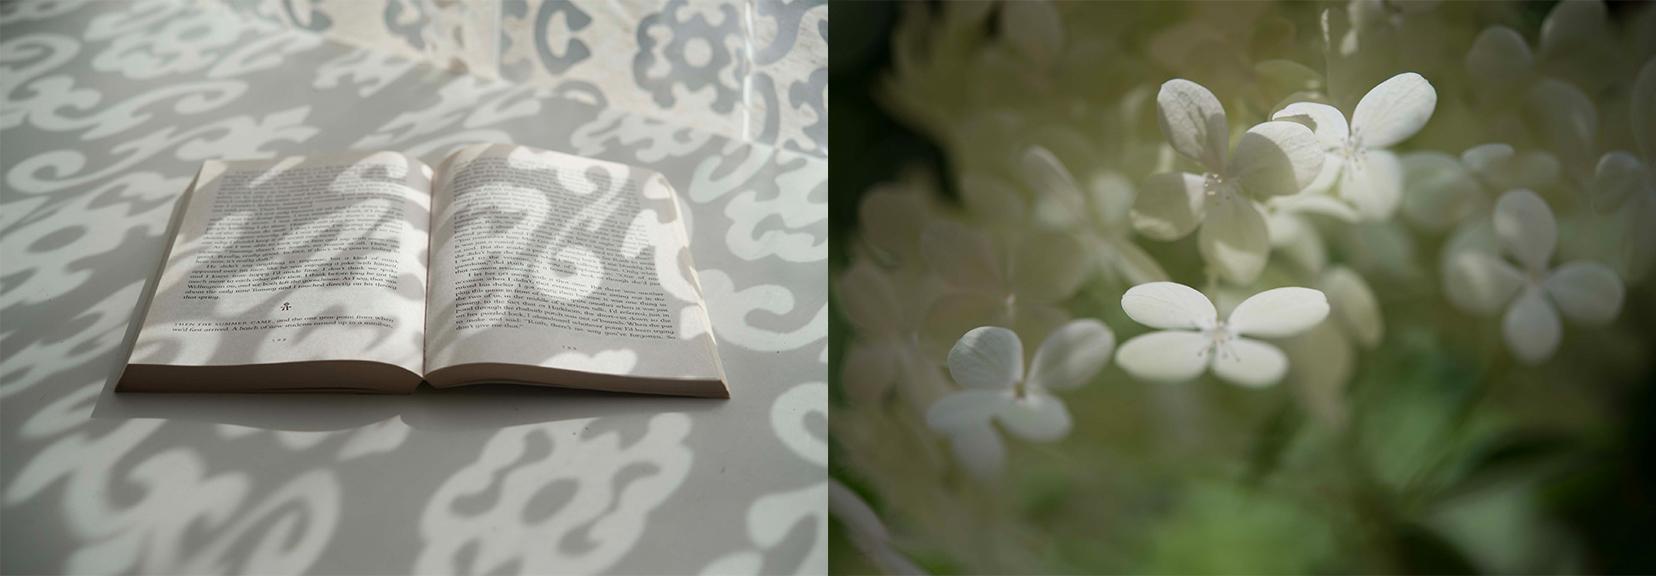 Openbook-Butterfly.jpg